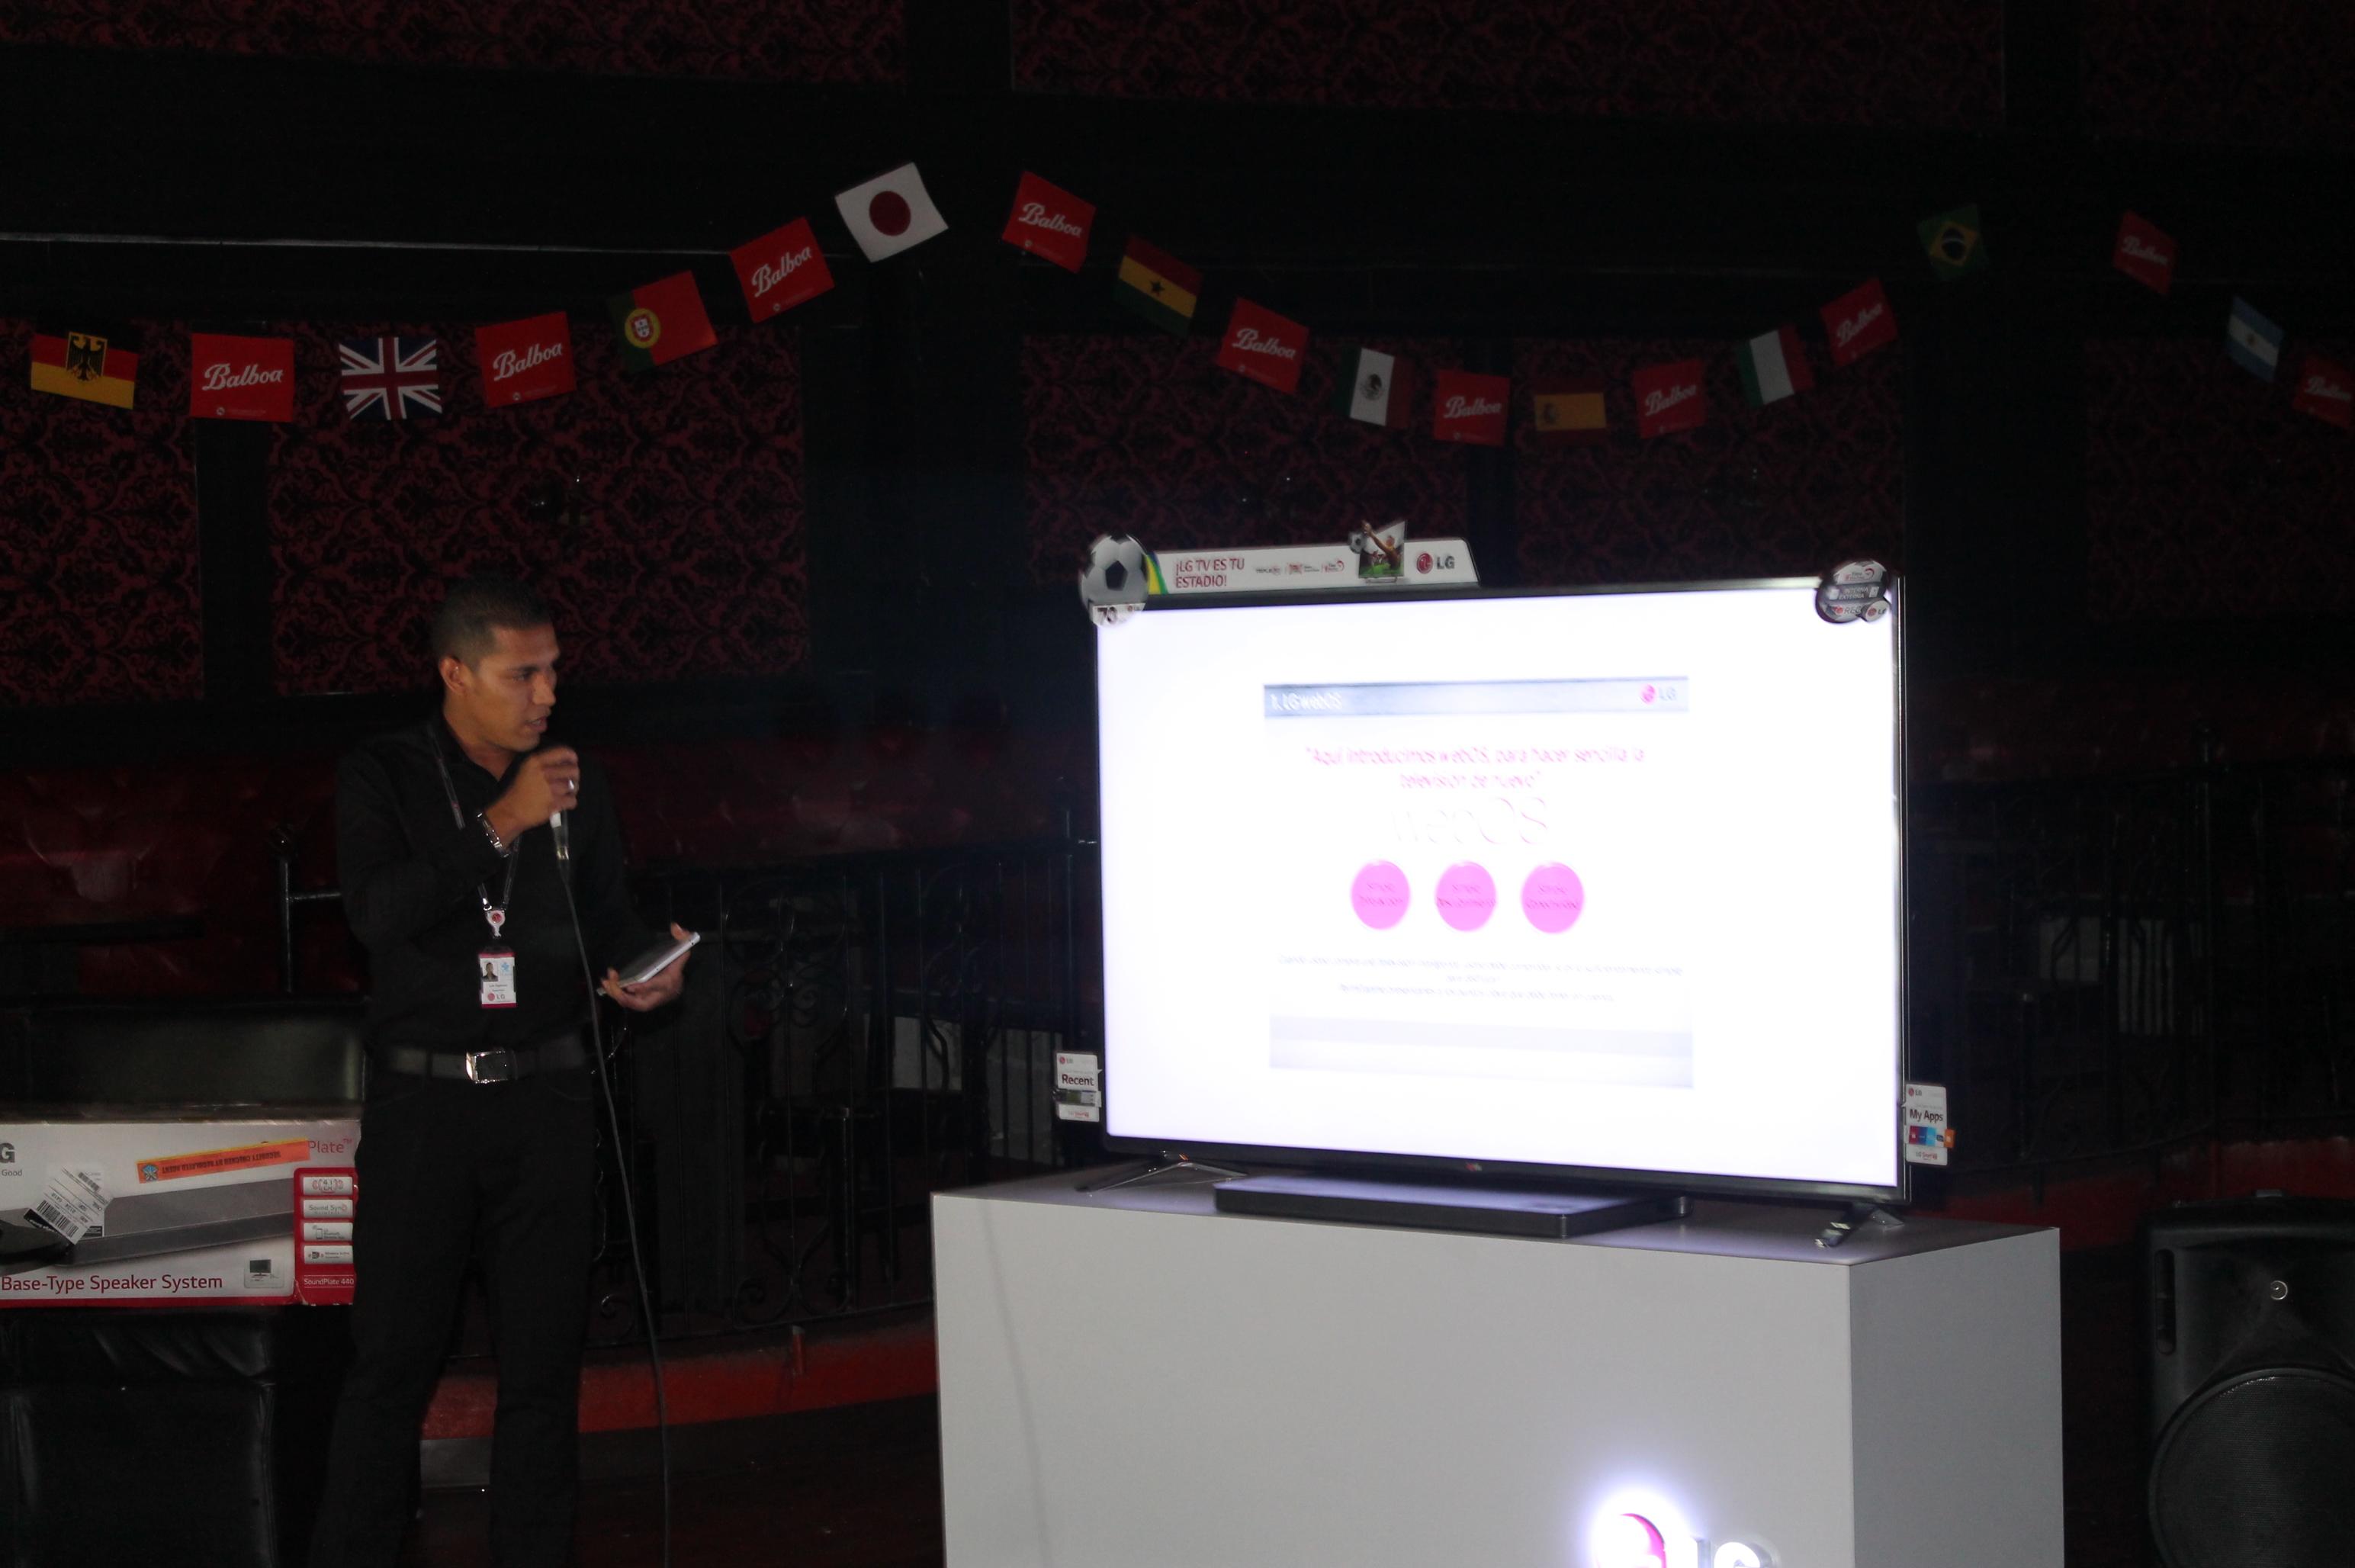 webOS 3.0 Panamá